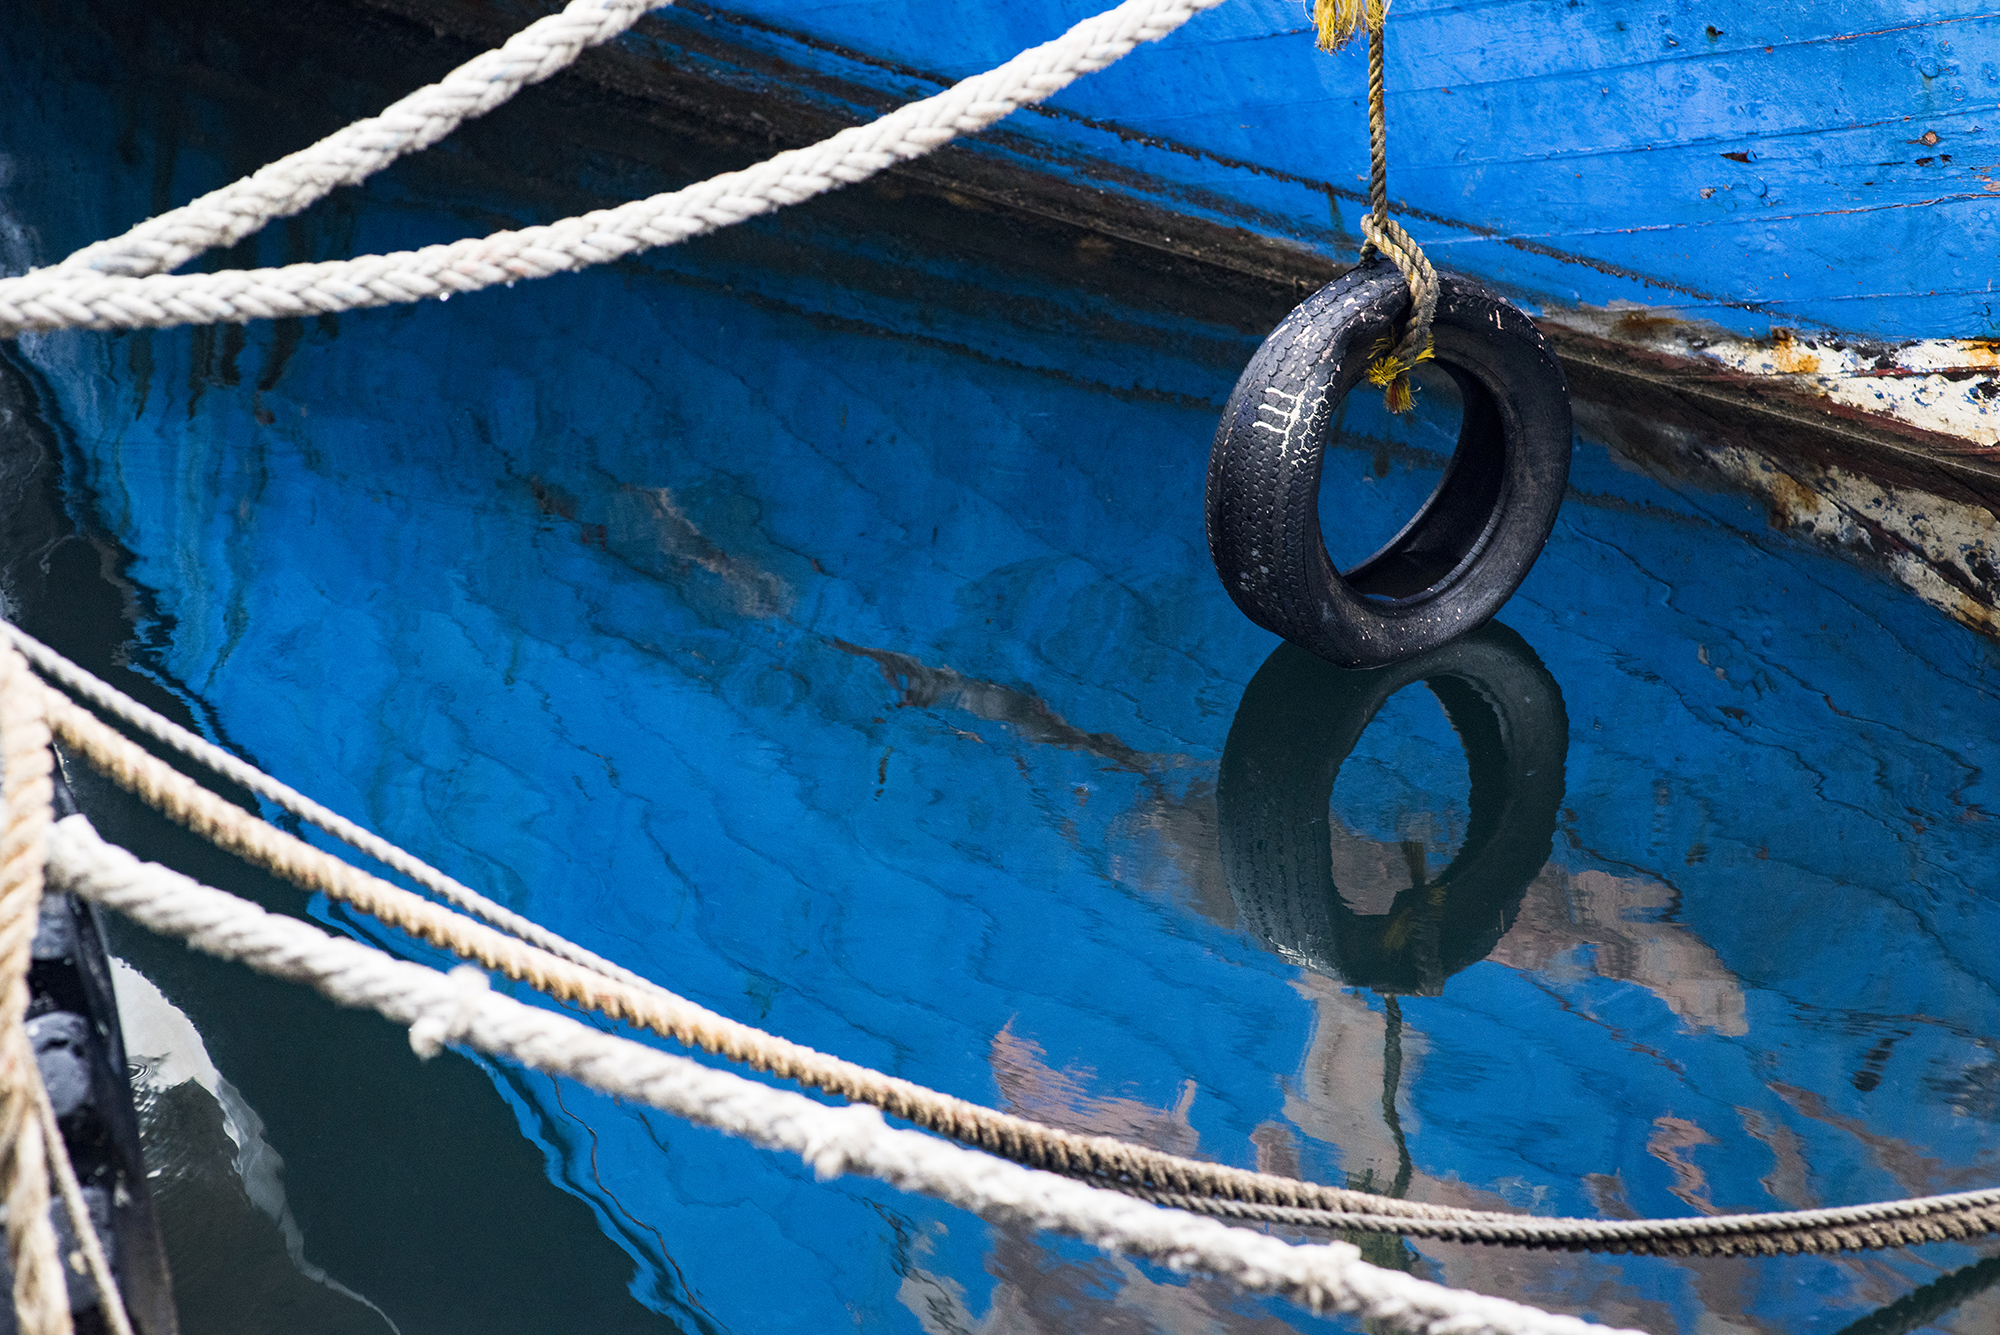 Boat-1016.jpg